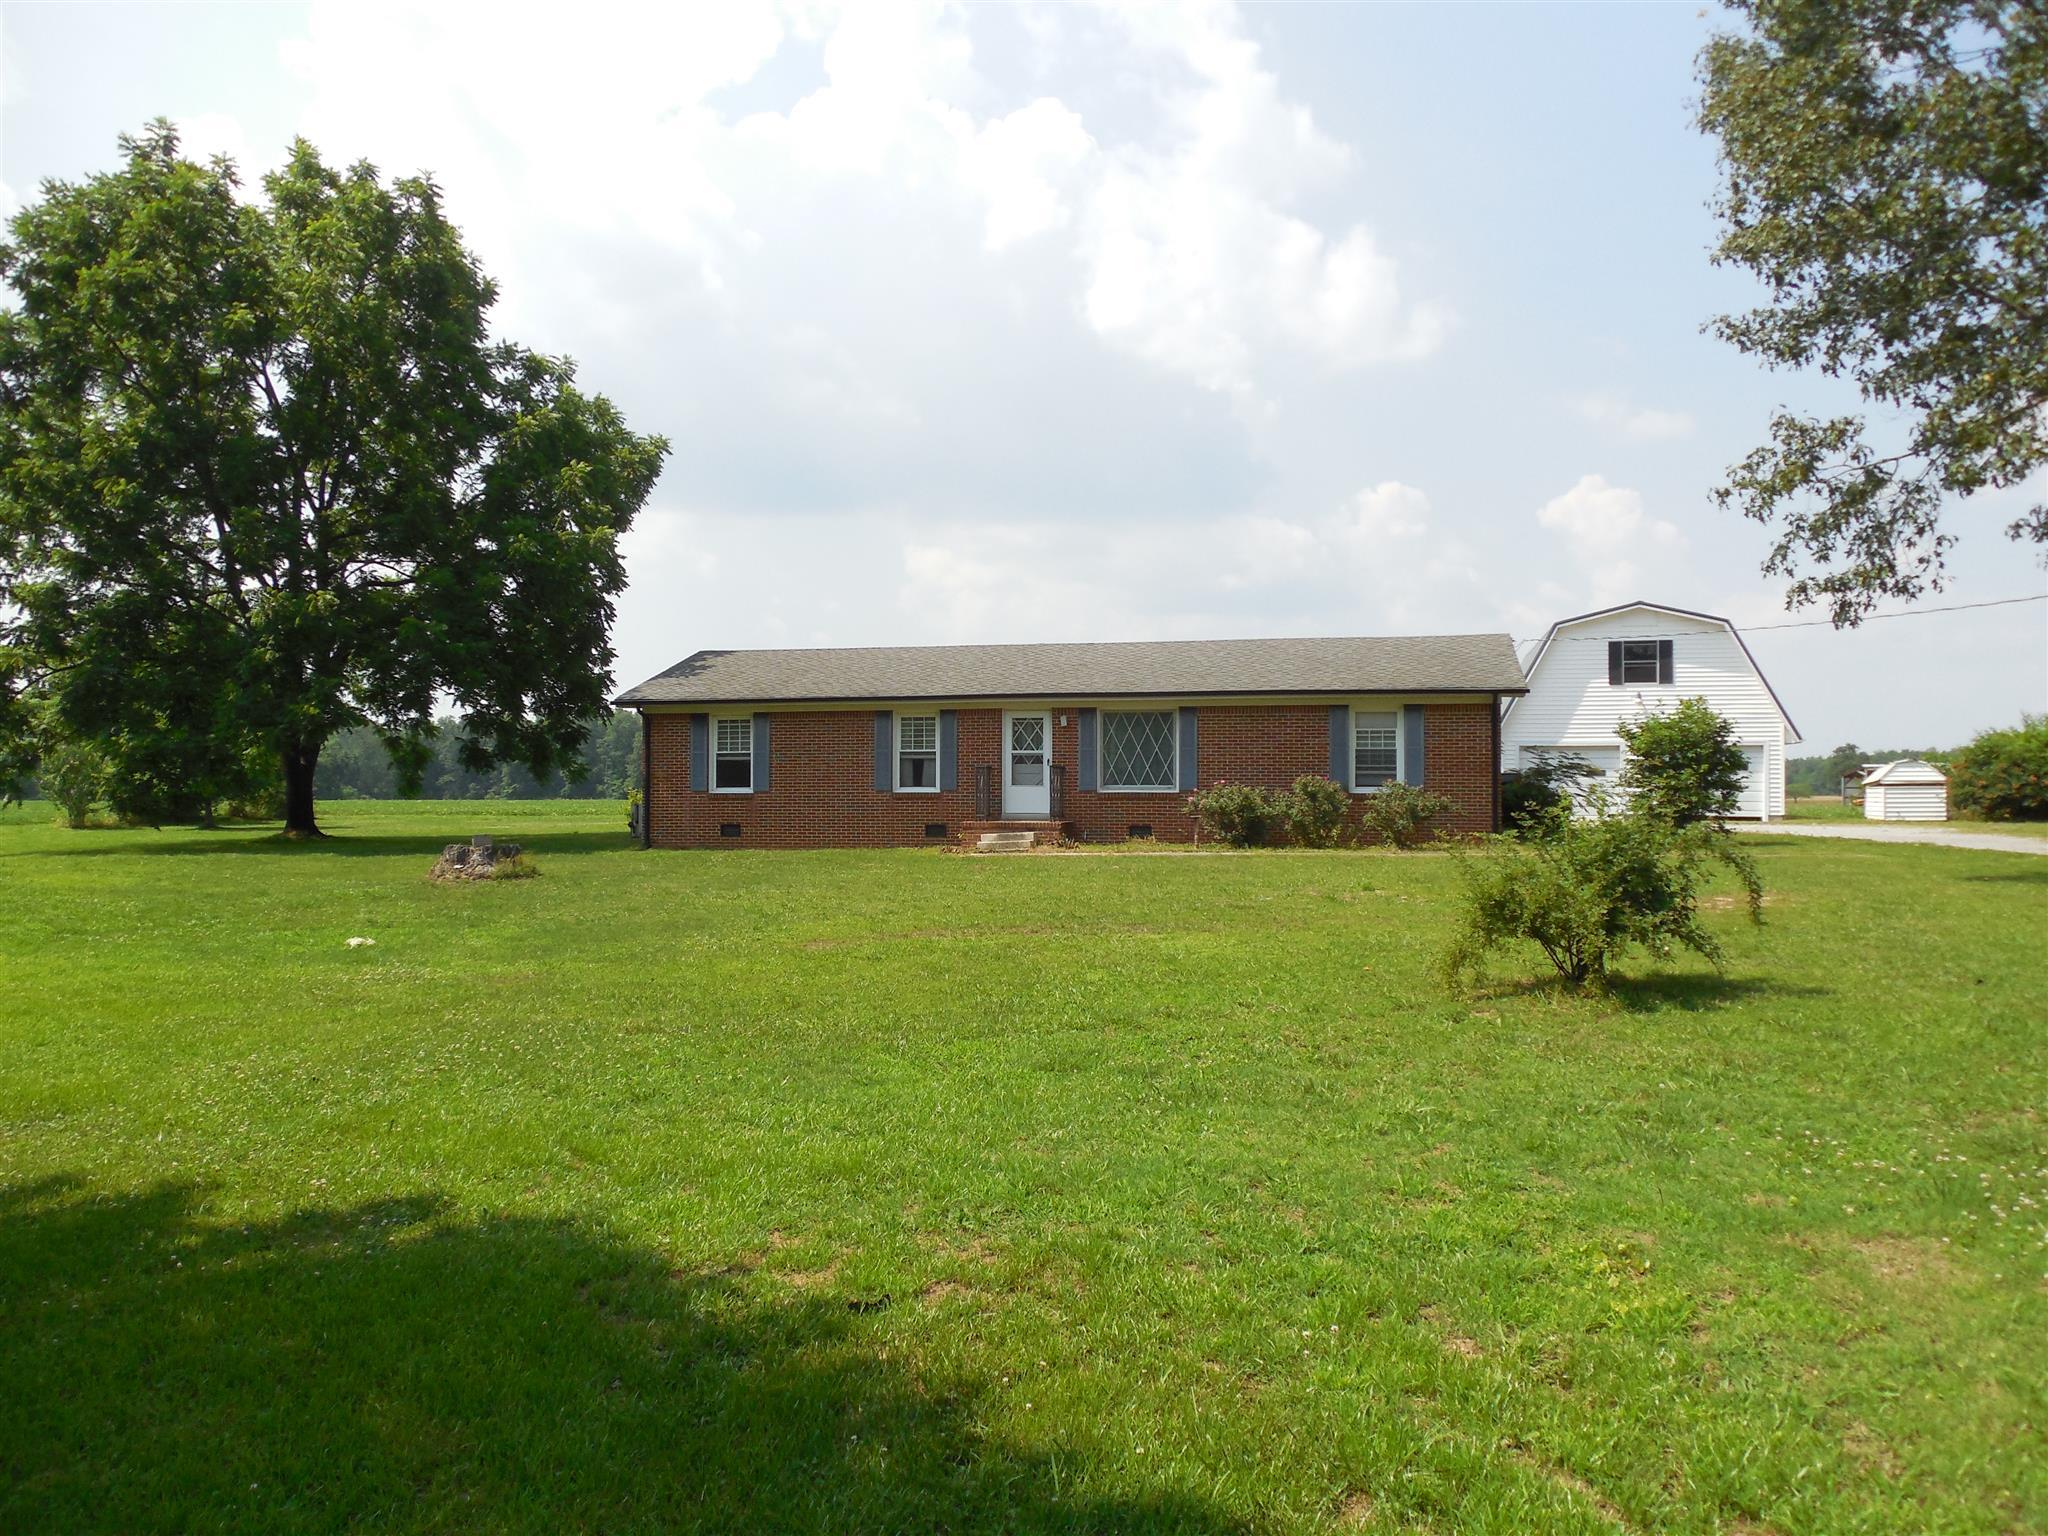 2989 K Parker Rd, Bradyville, TN 37026